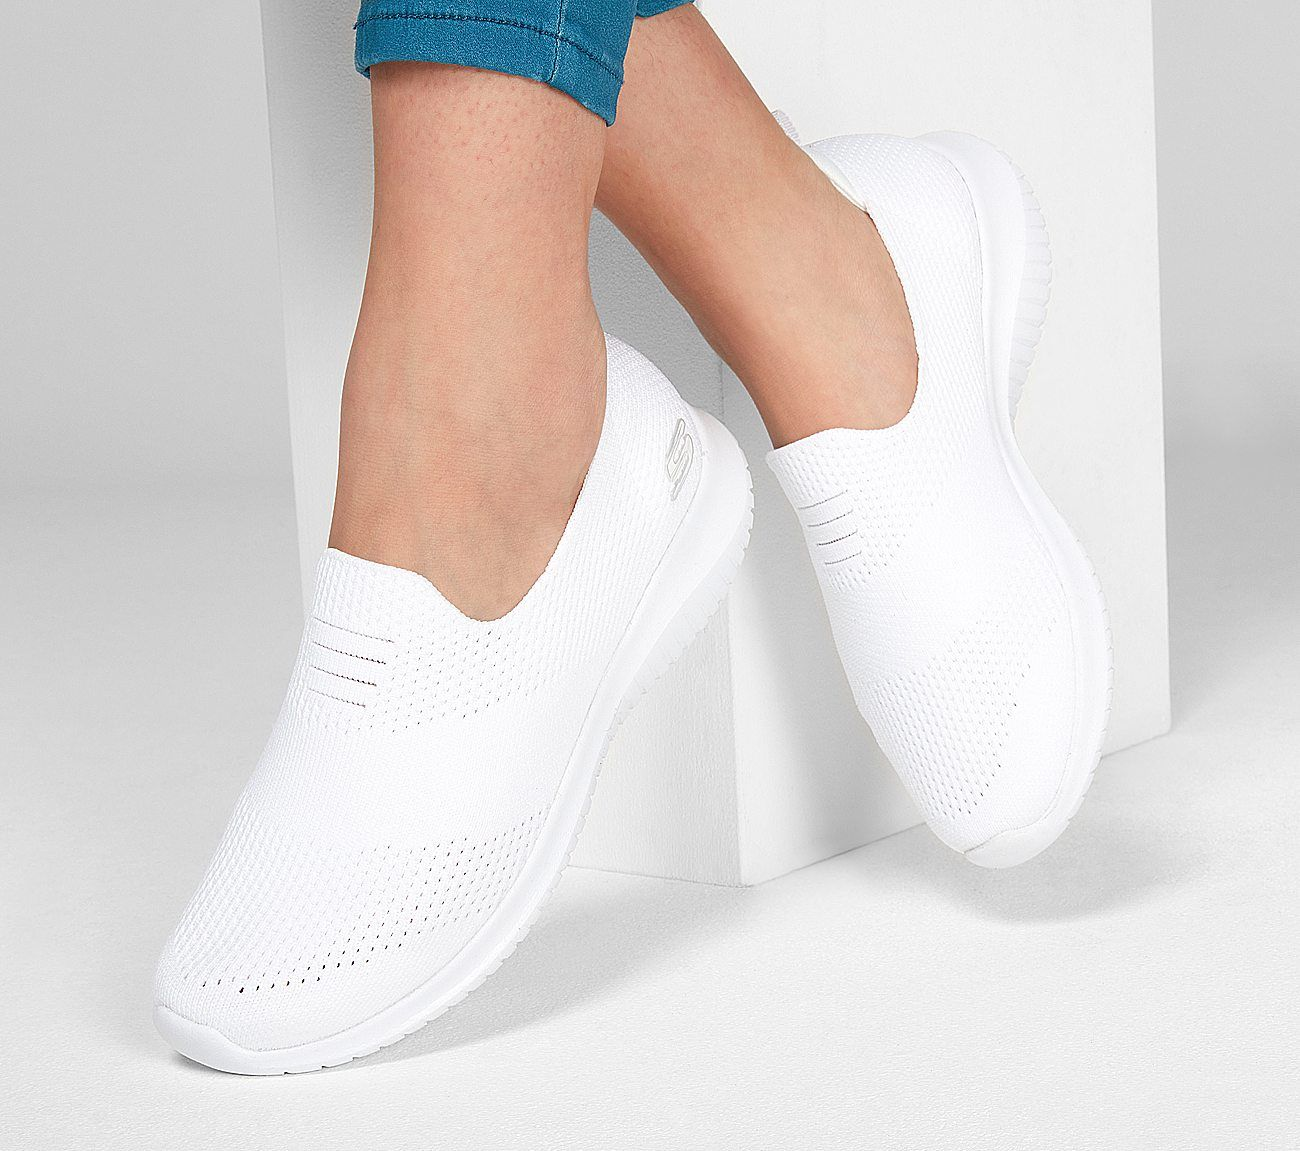 skechers women's ultra flex white